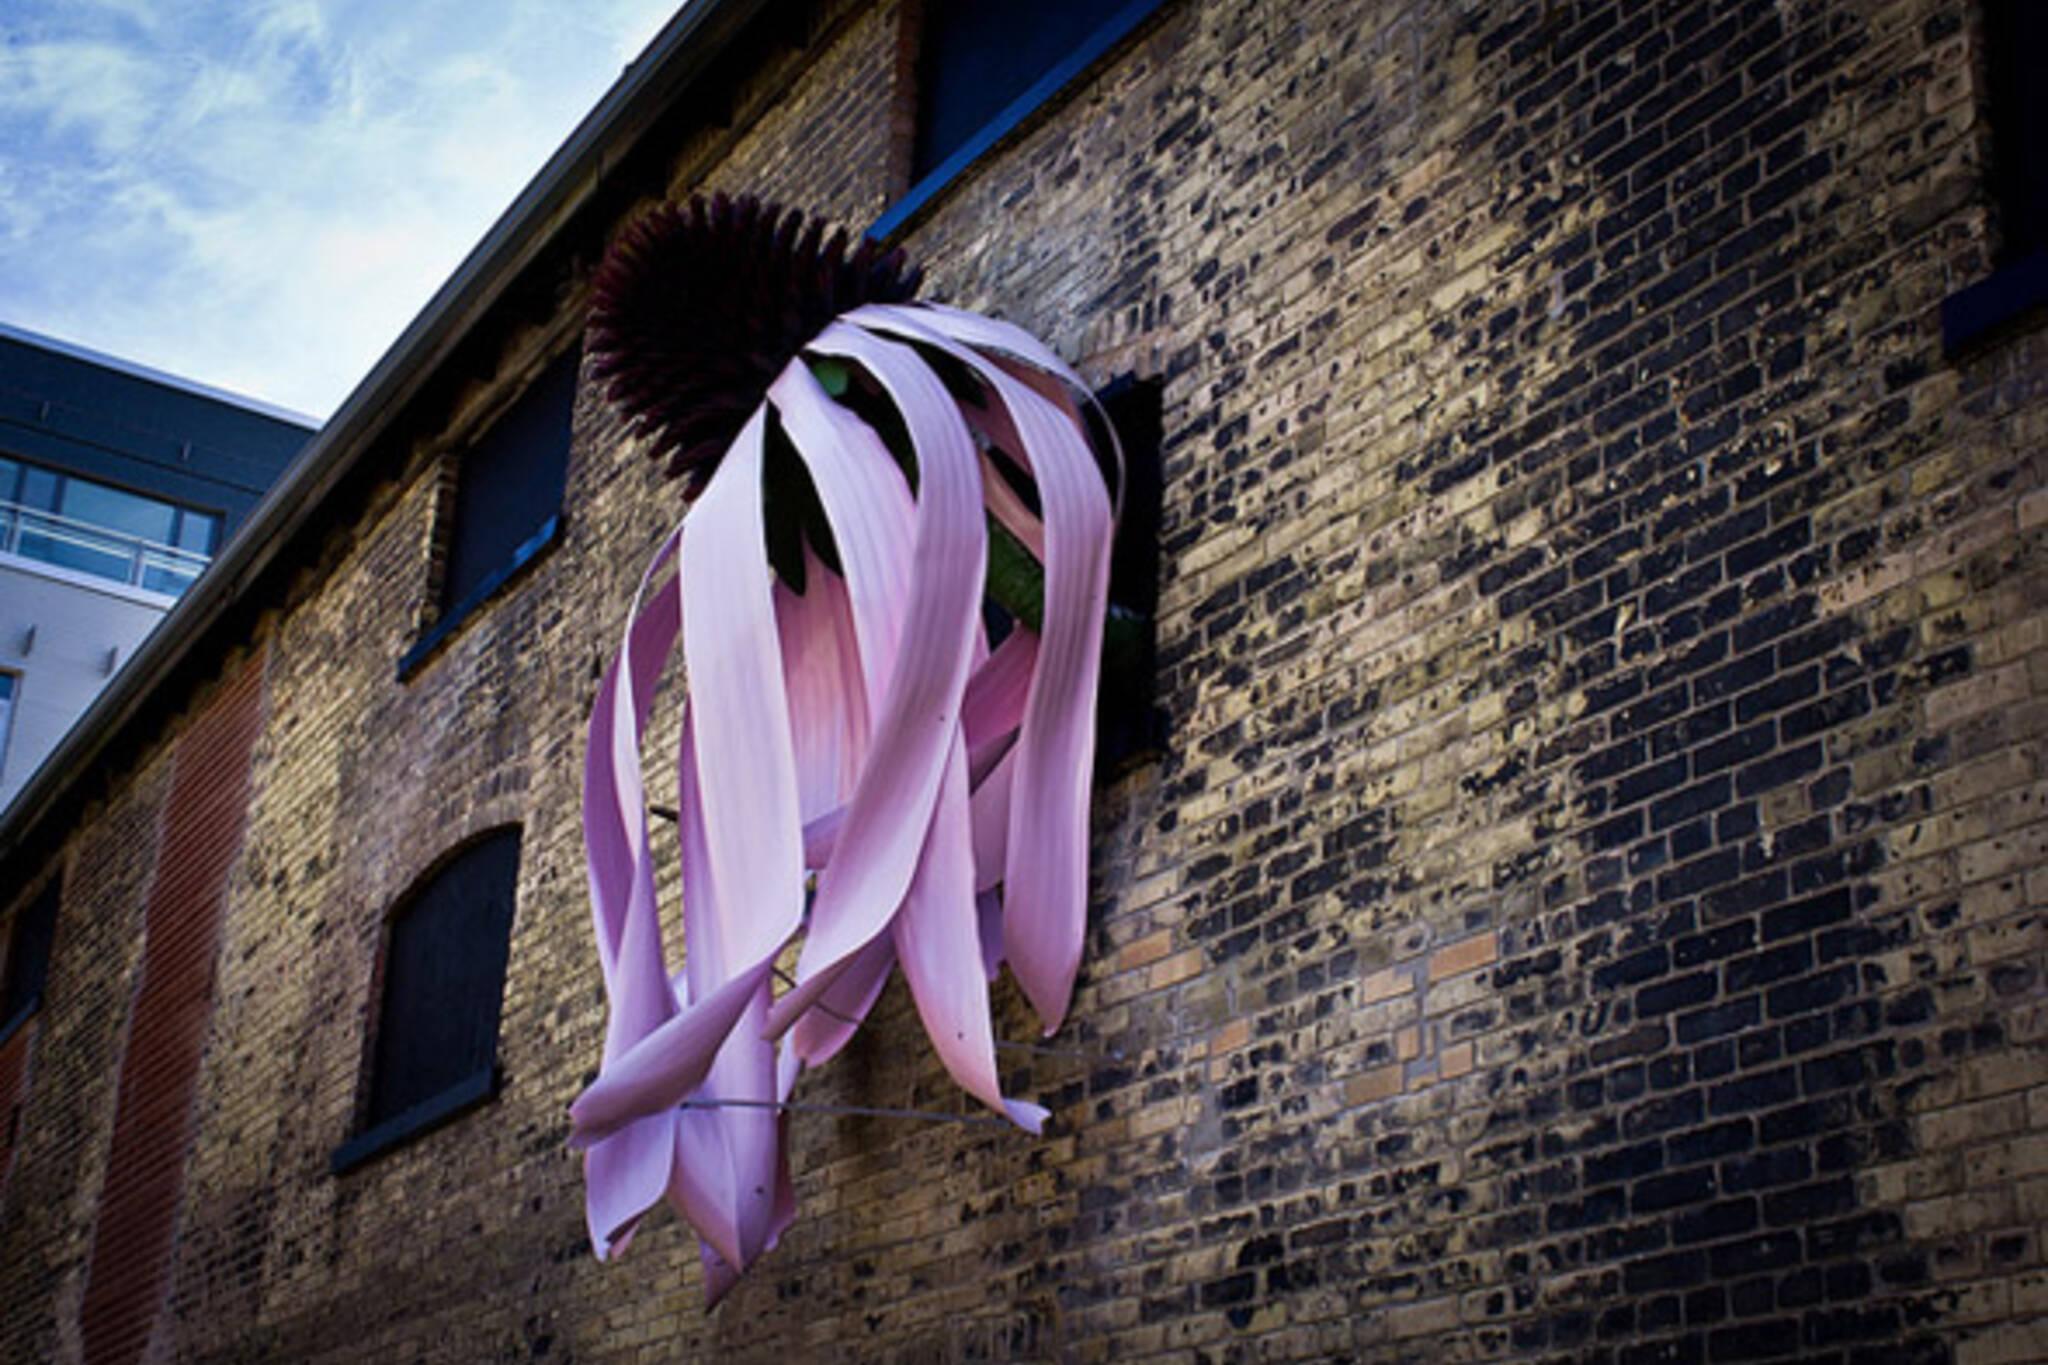 Toronto flower art installation